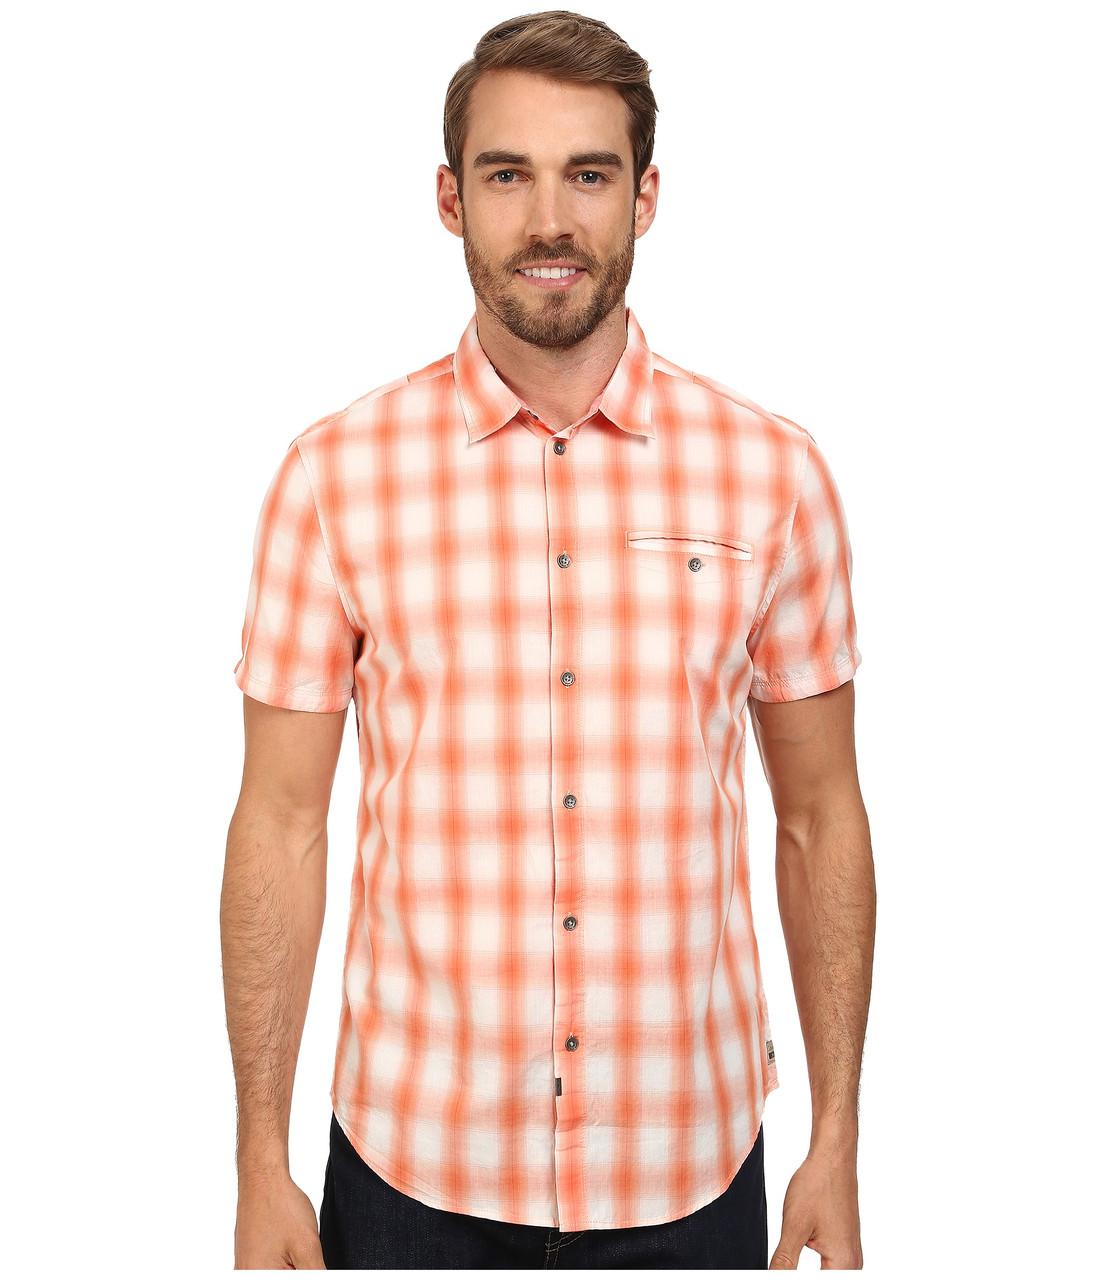 Рубашка Calvin Klein Jeans, XL, Sunset, 41JW145-811